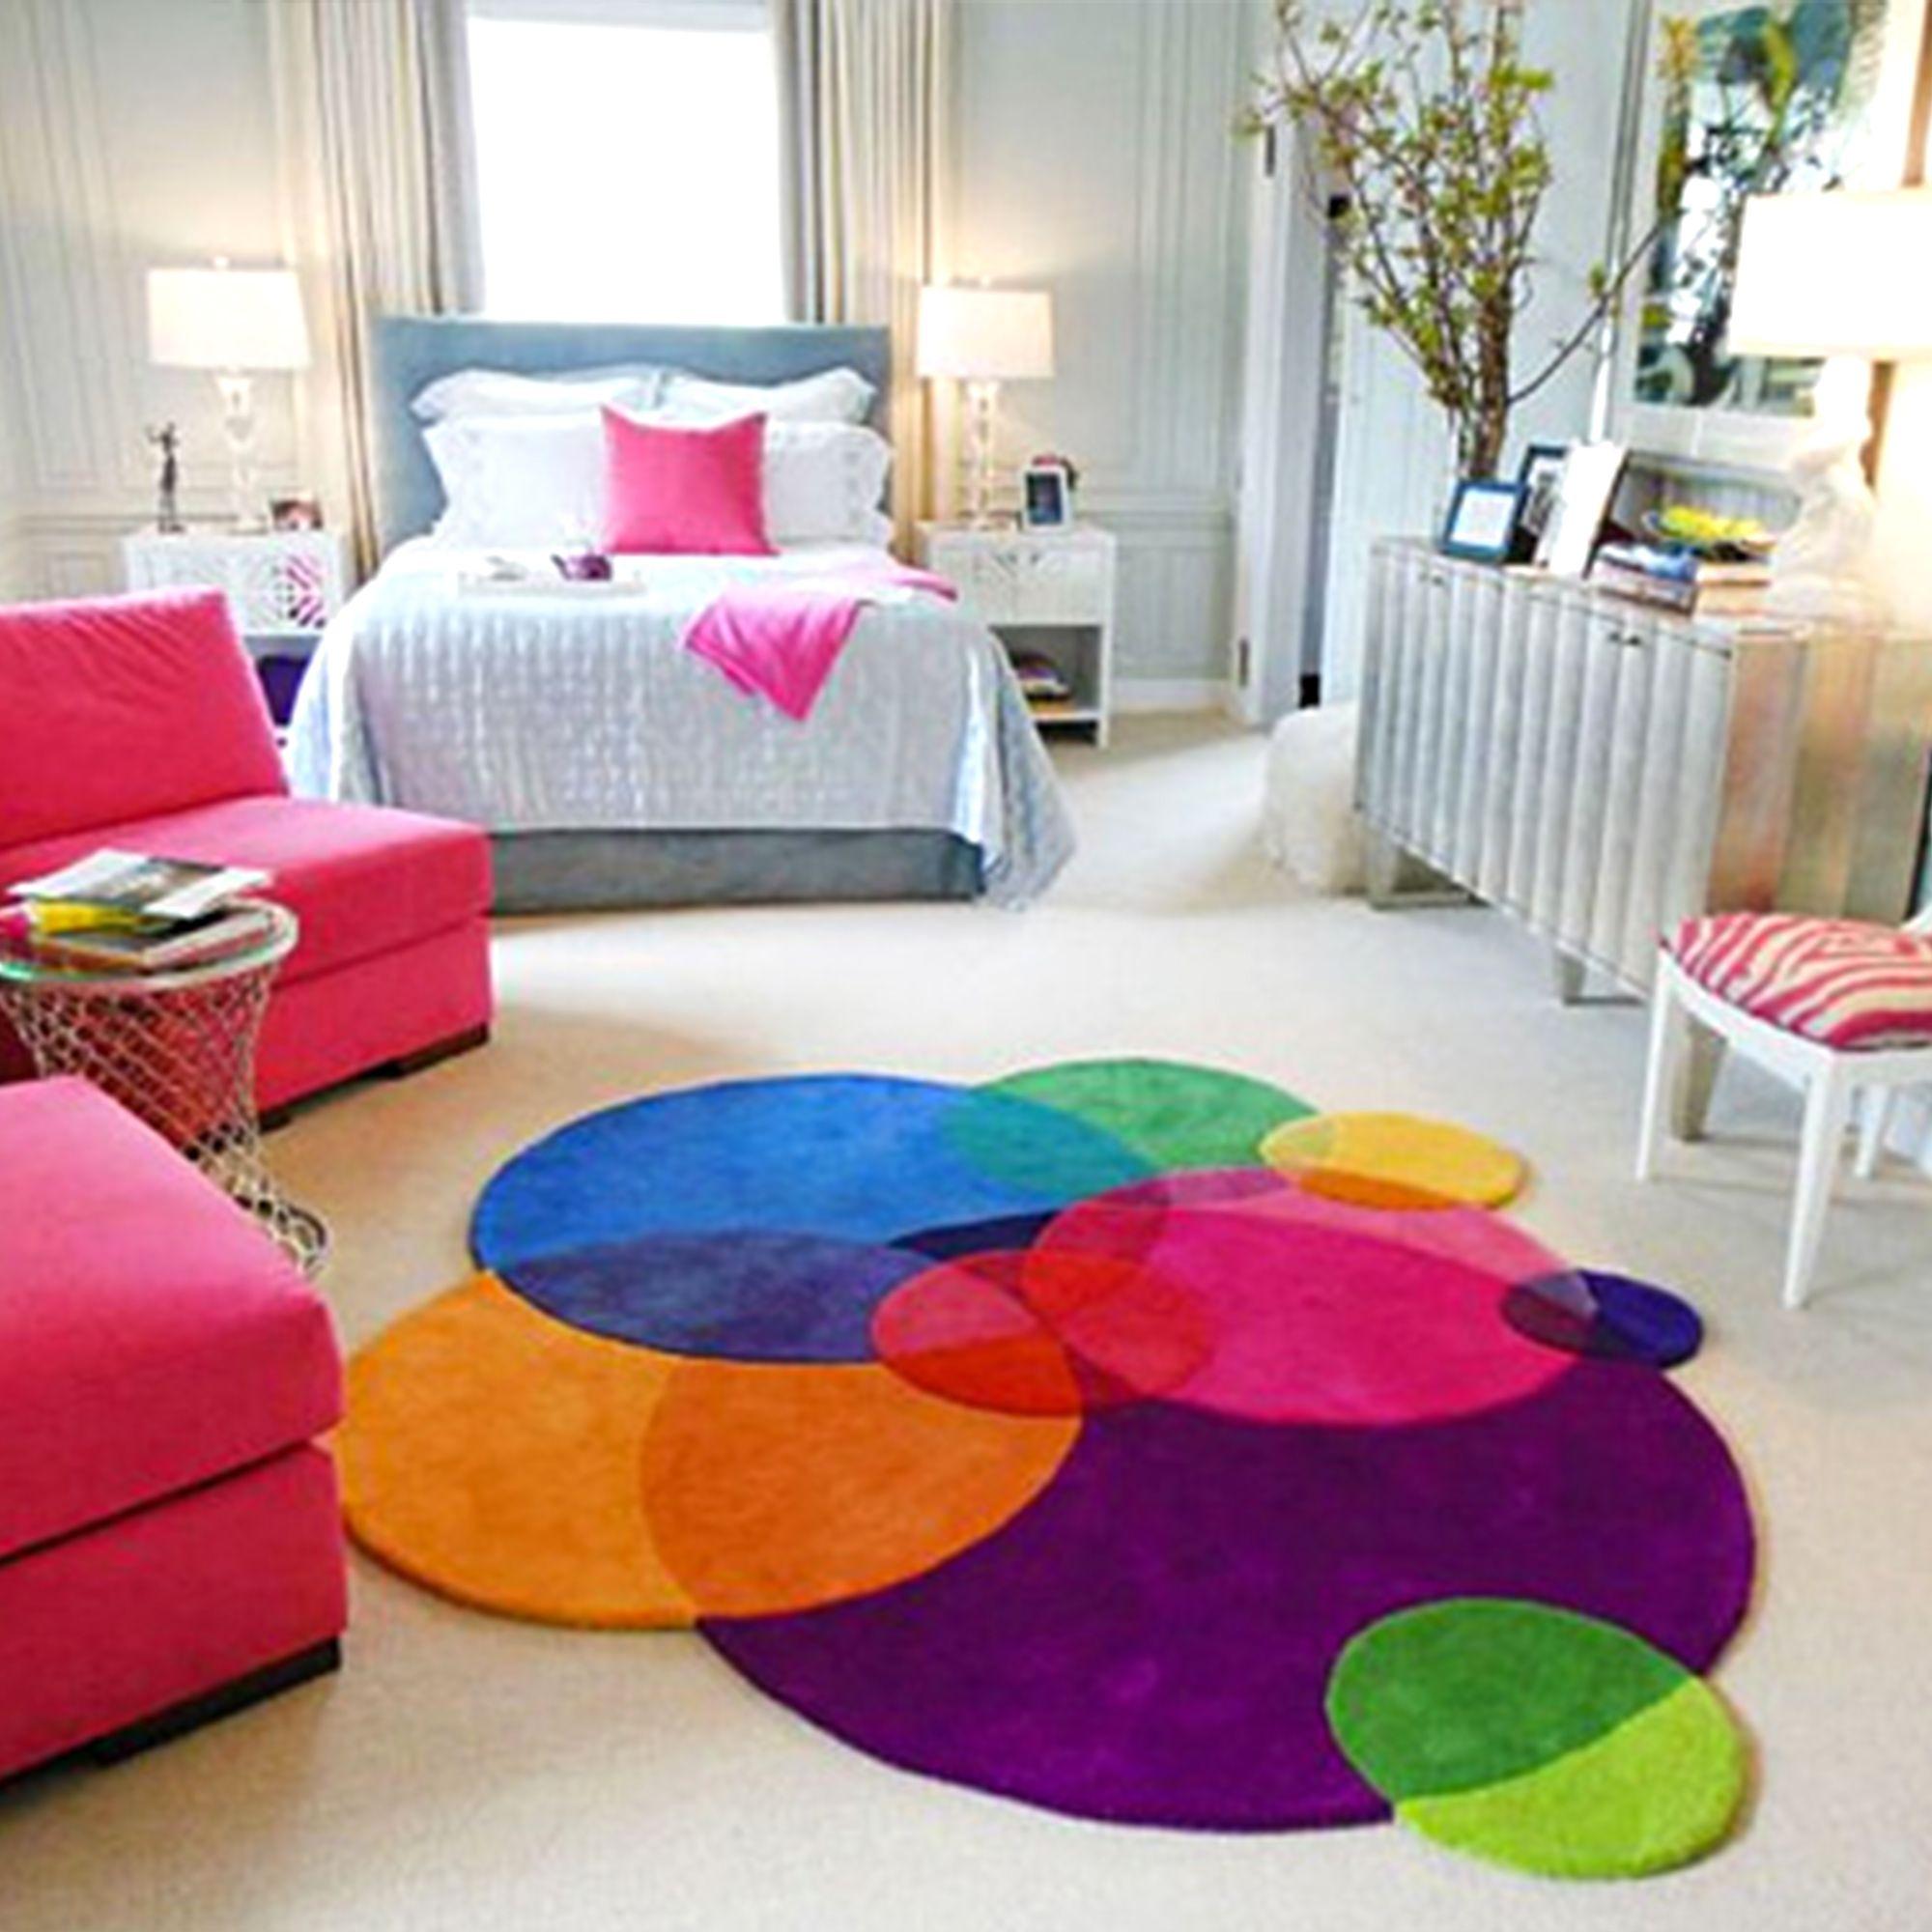 Bubbles Luxury Designer Rug Sonya Winner Rugs Studio Contemporary Round Rugs Rugs Uk Modern Colorful Rugs